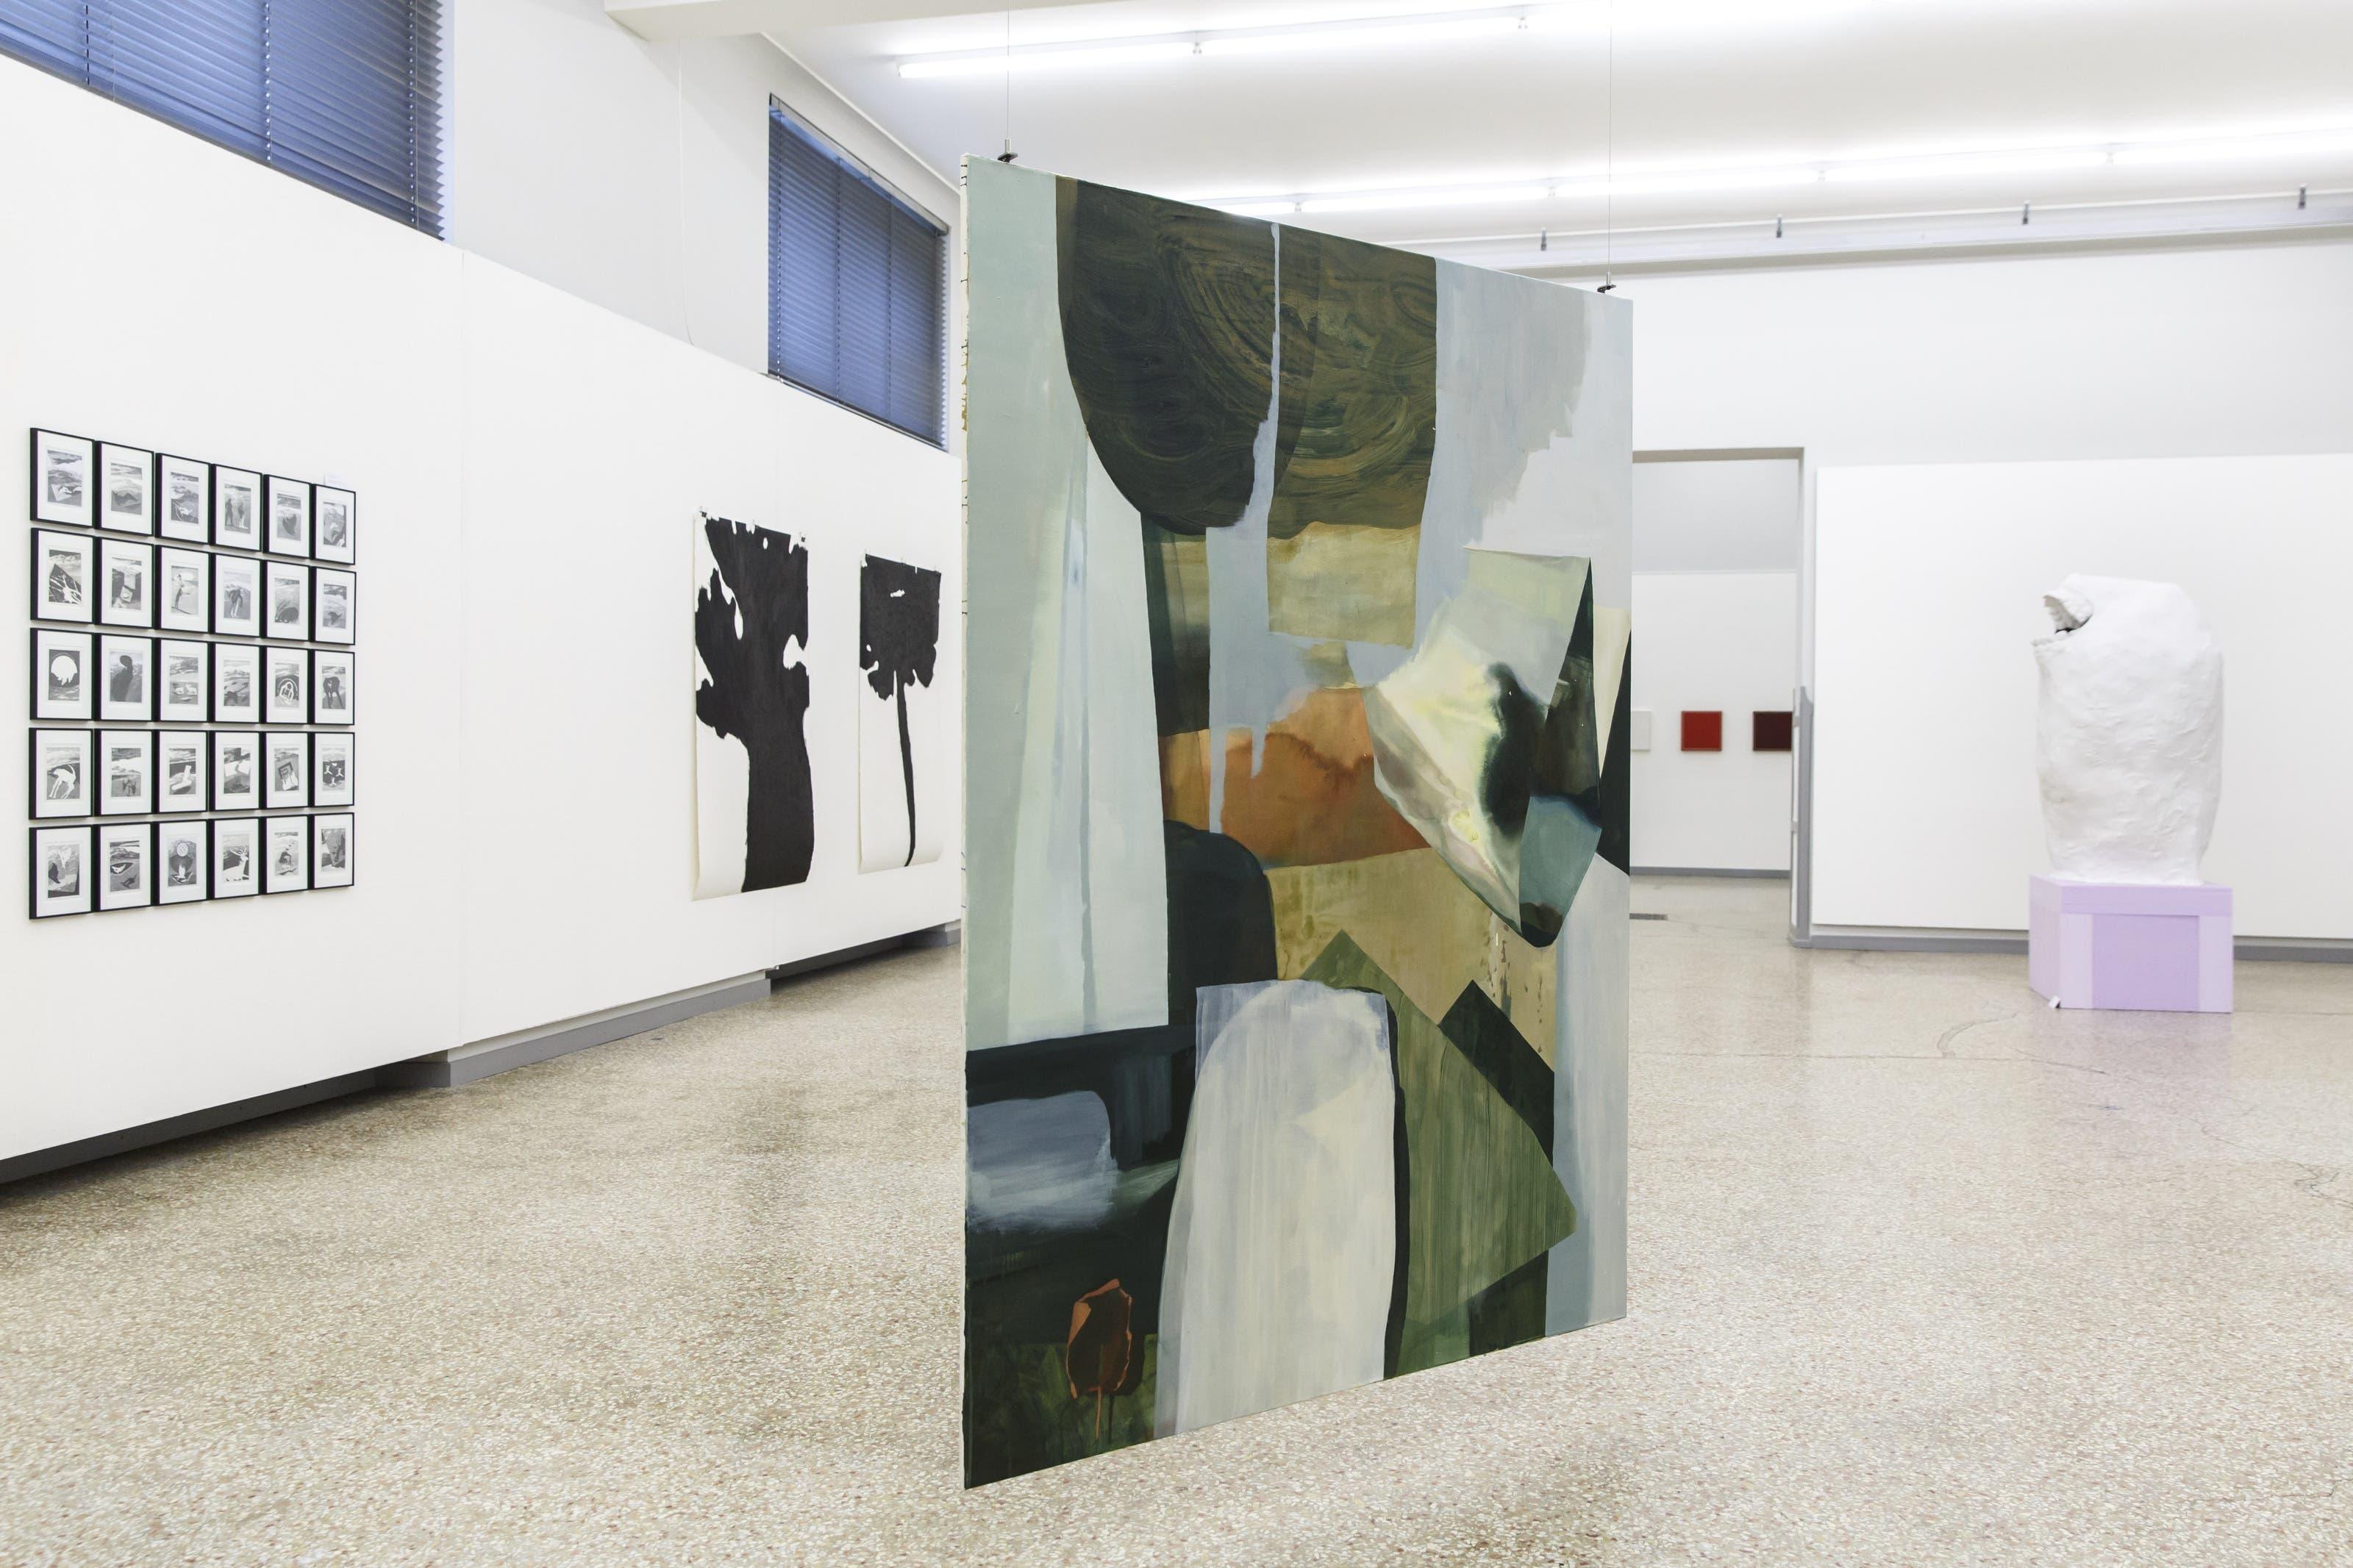 Jahresausstellung Kunstmuseum Solothurn